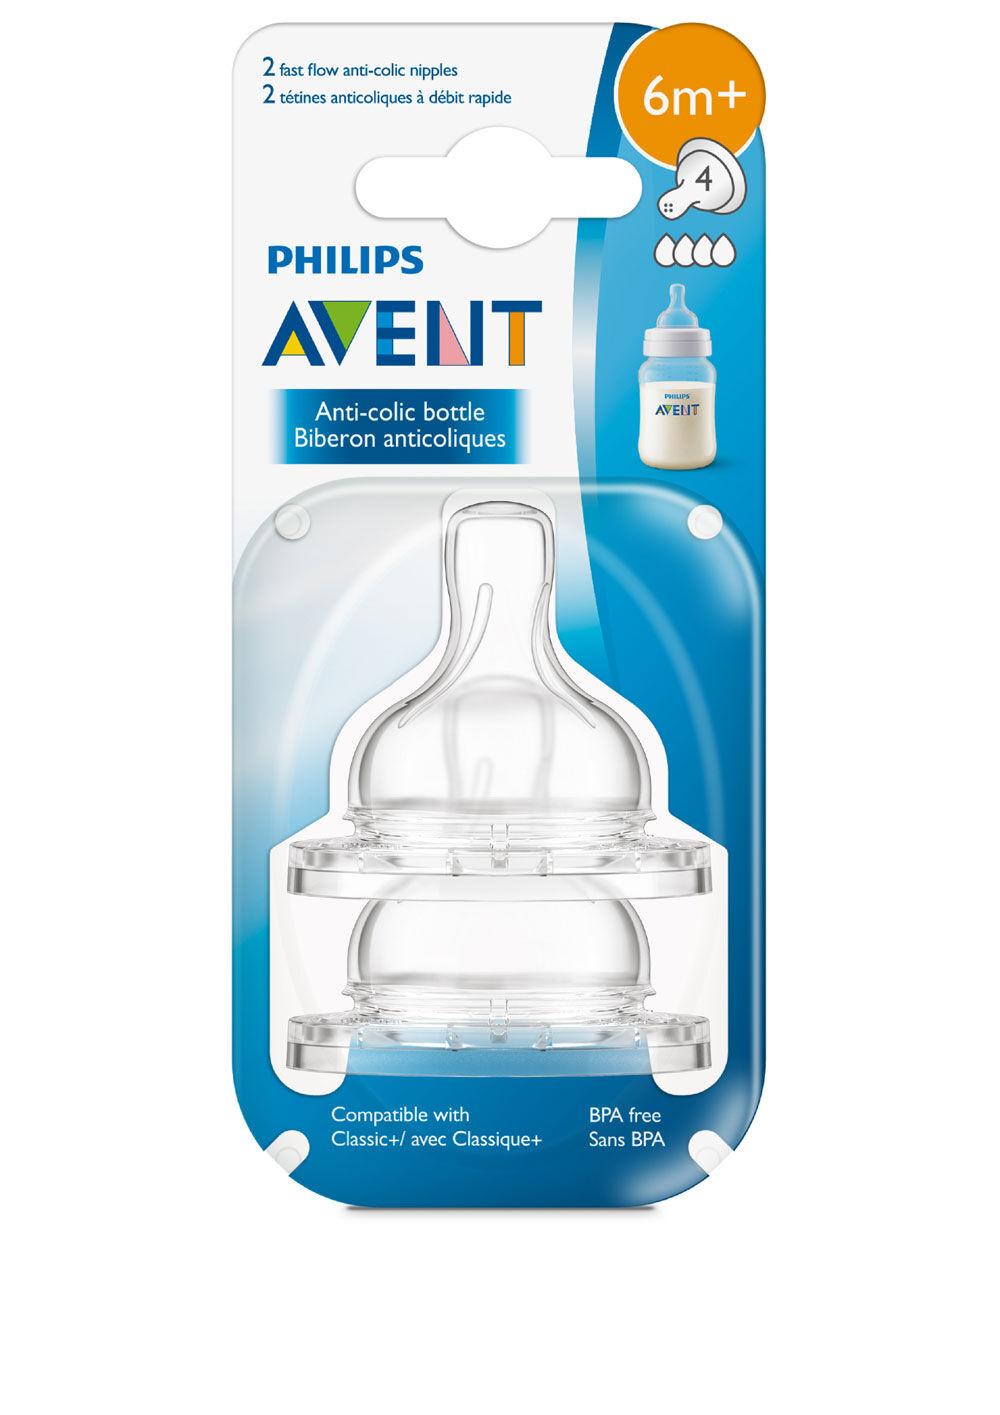 Clear Philips Avent Anti-Colic Nipple Slow Flow Dishwasher Safe MYTODDLER New